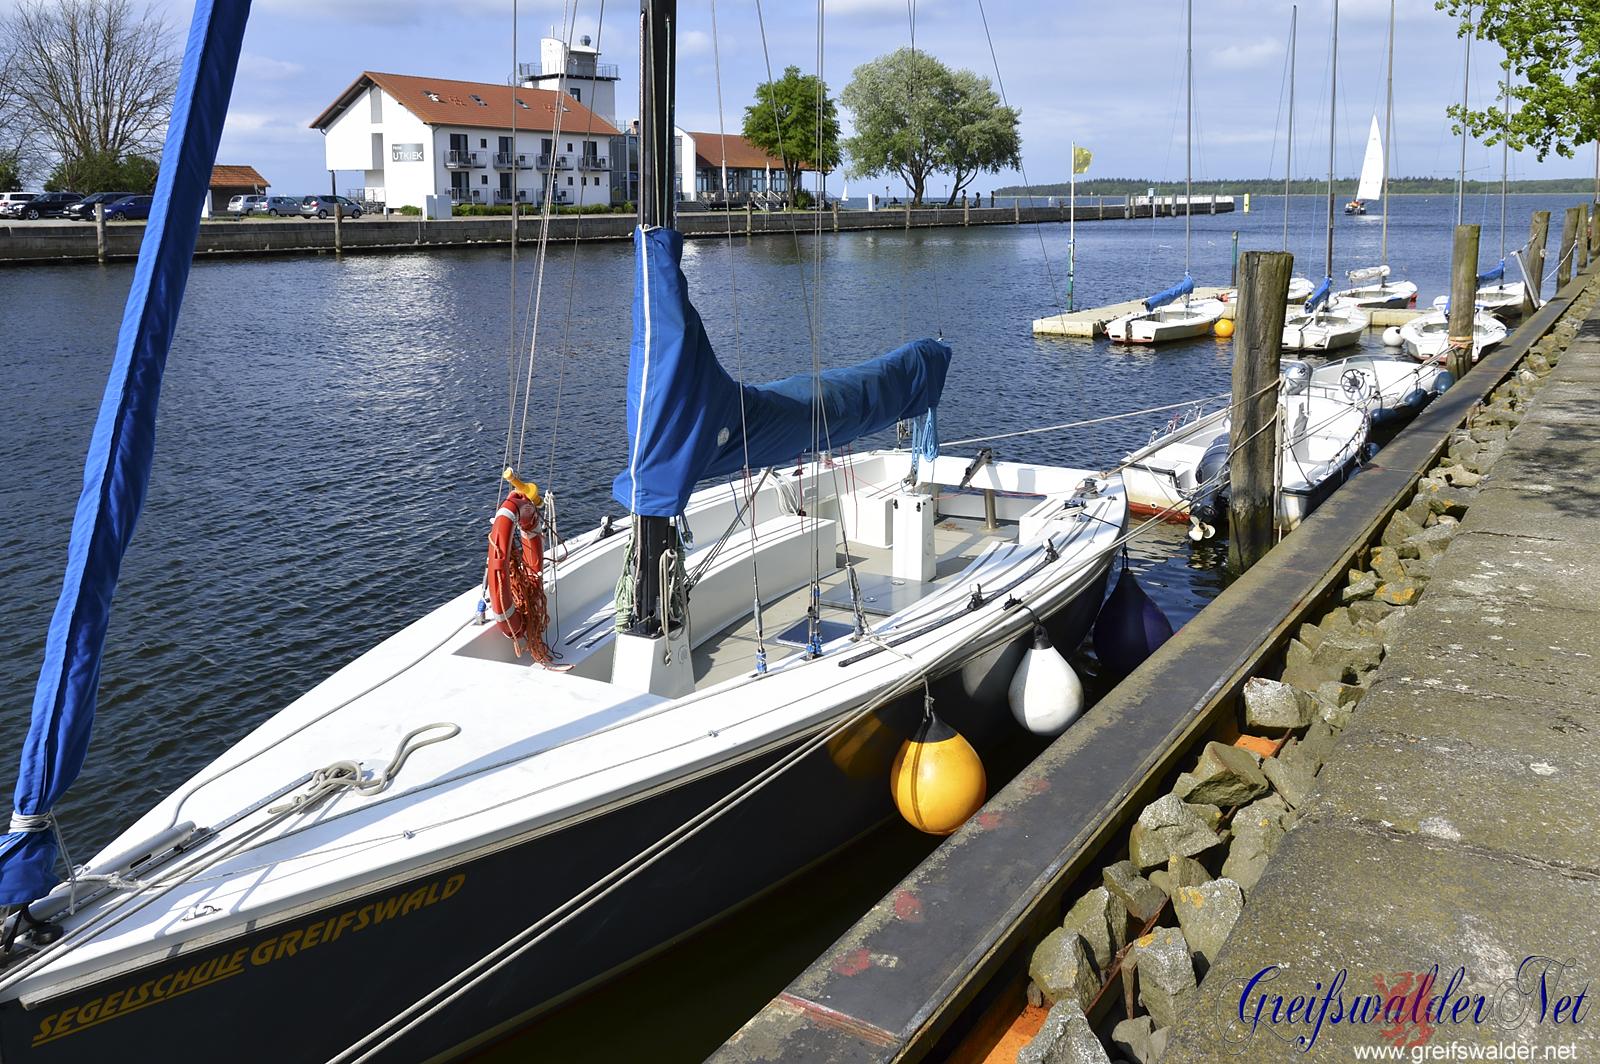 sonniger Nachmittag in Greifswald-Wieck